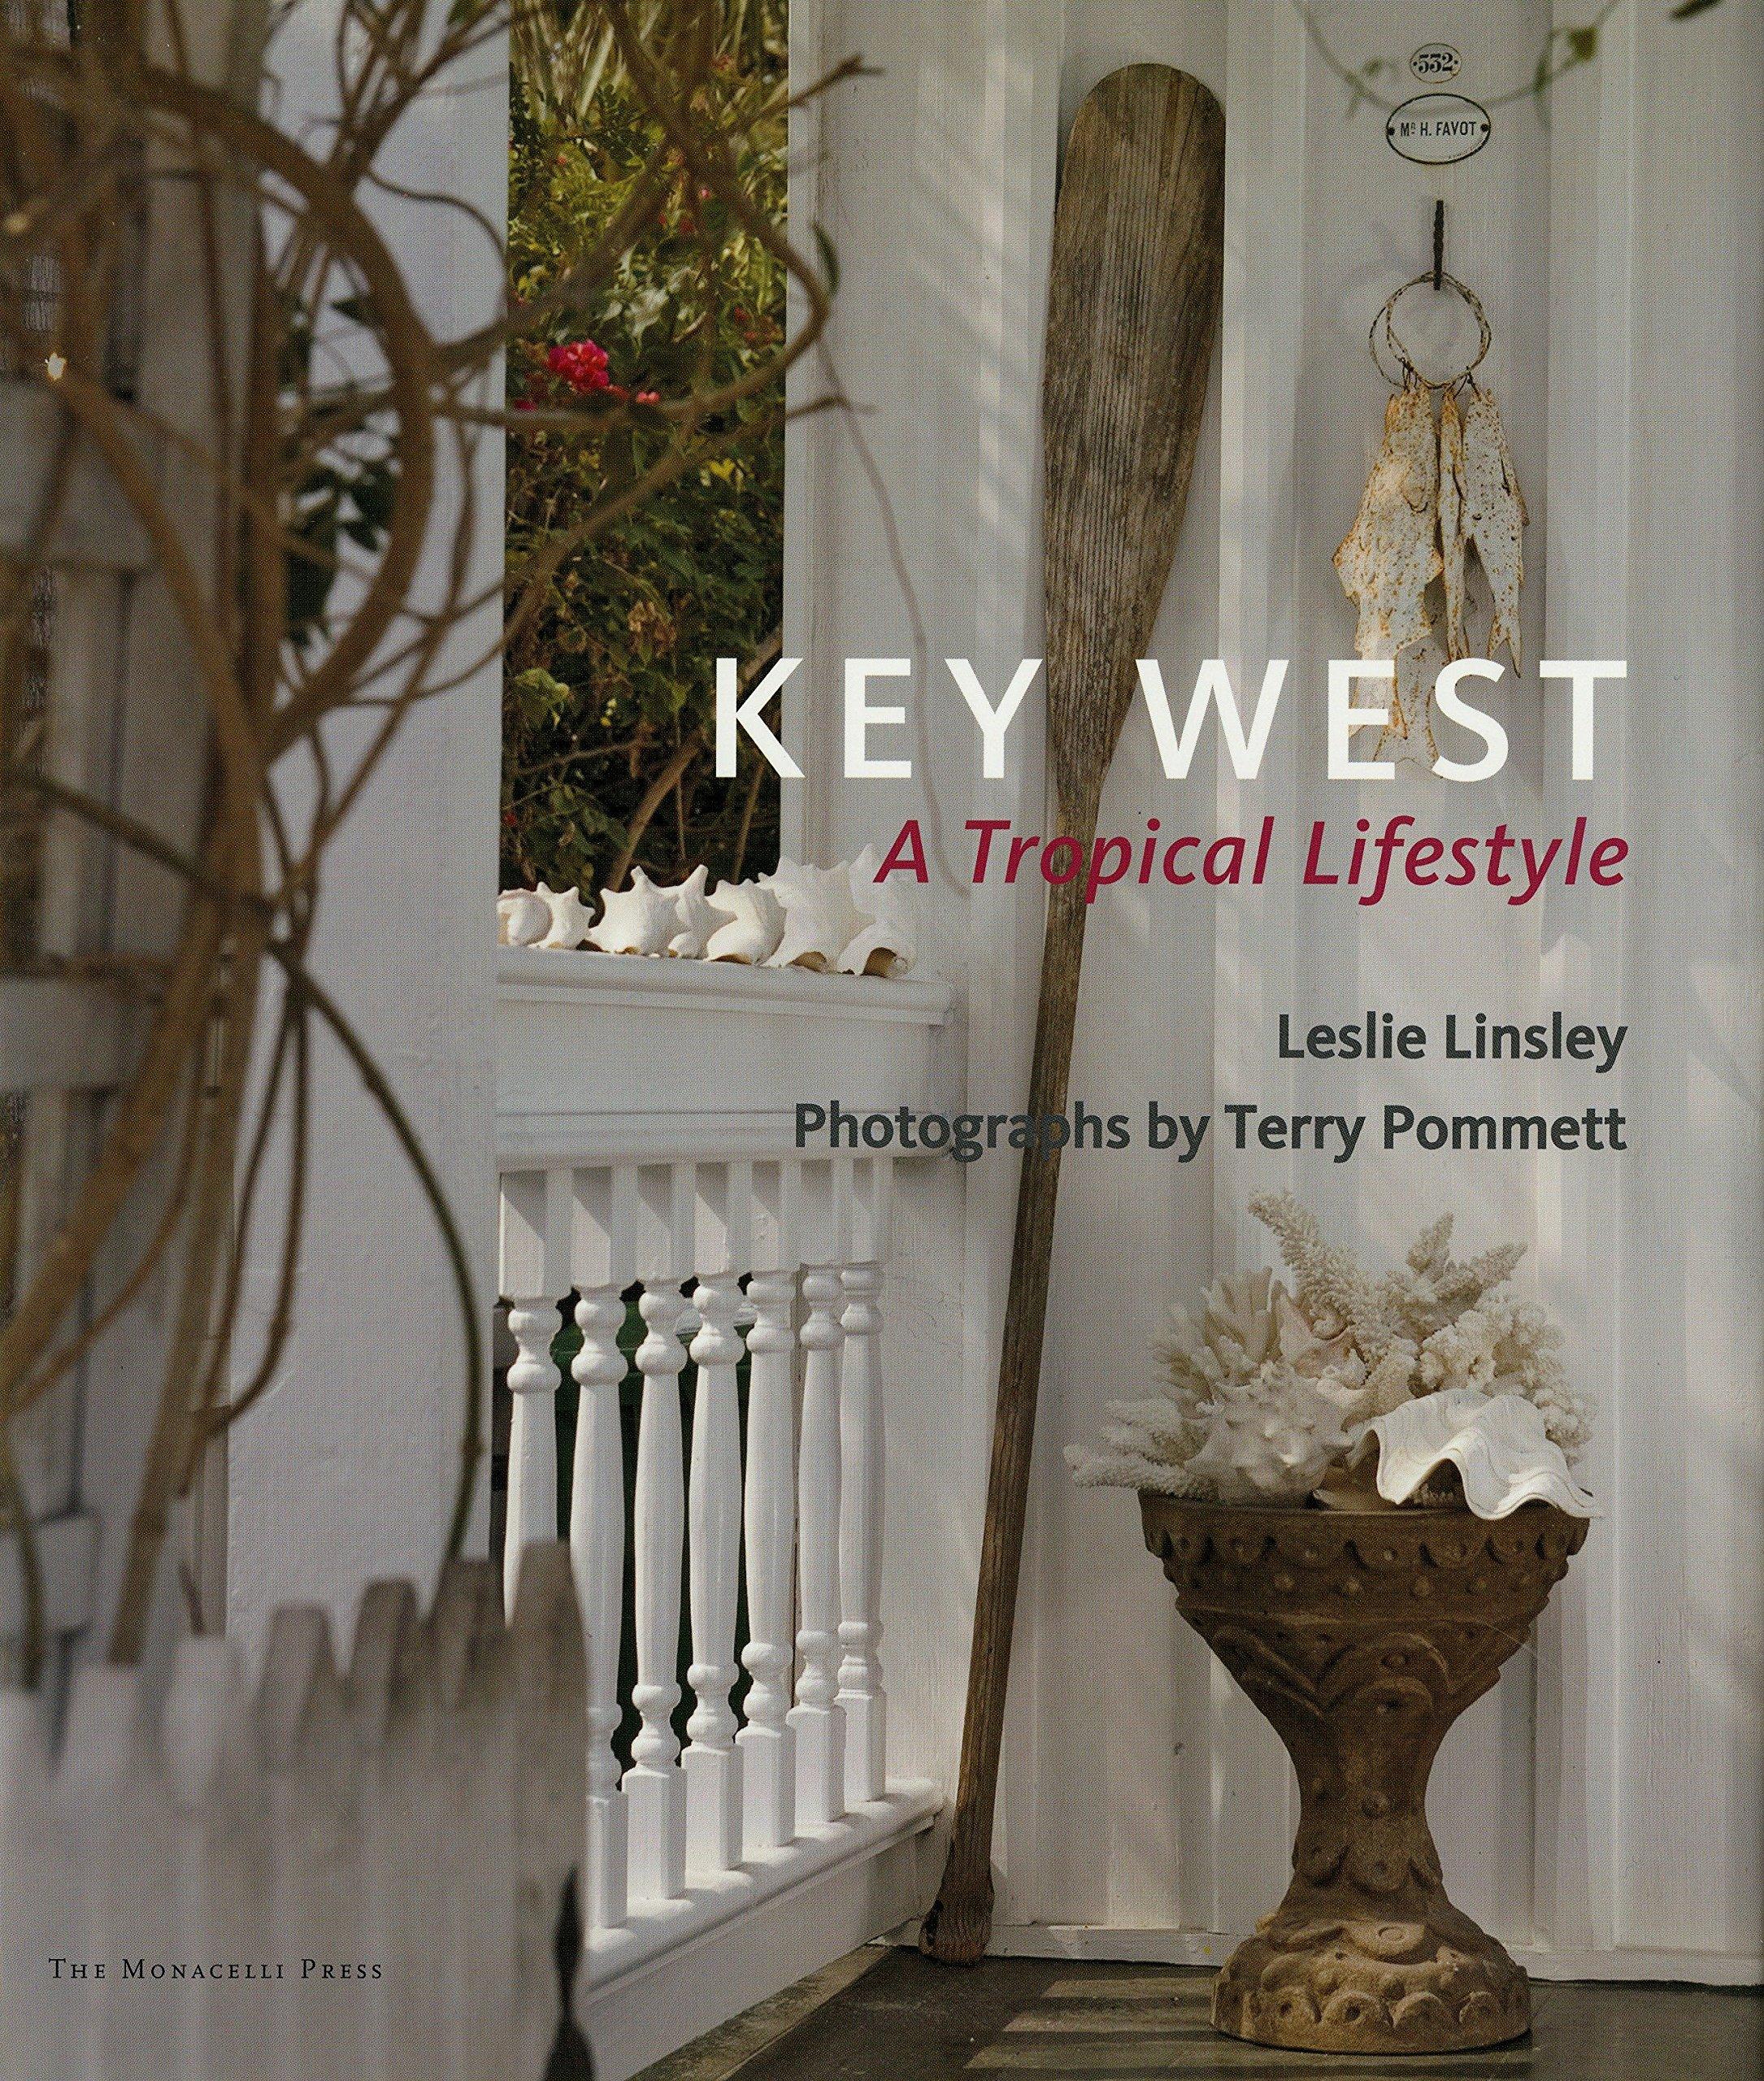 Key West: A Tropical Lifestyle ebook